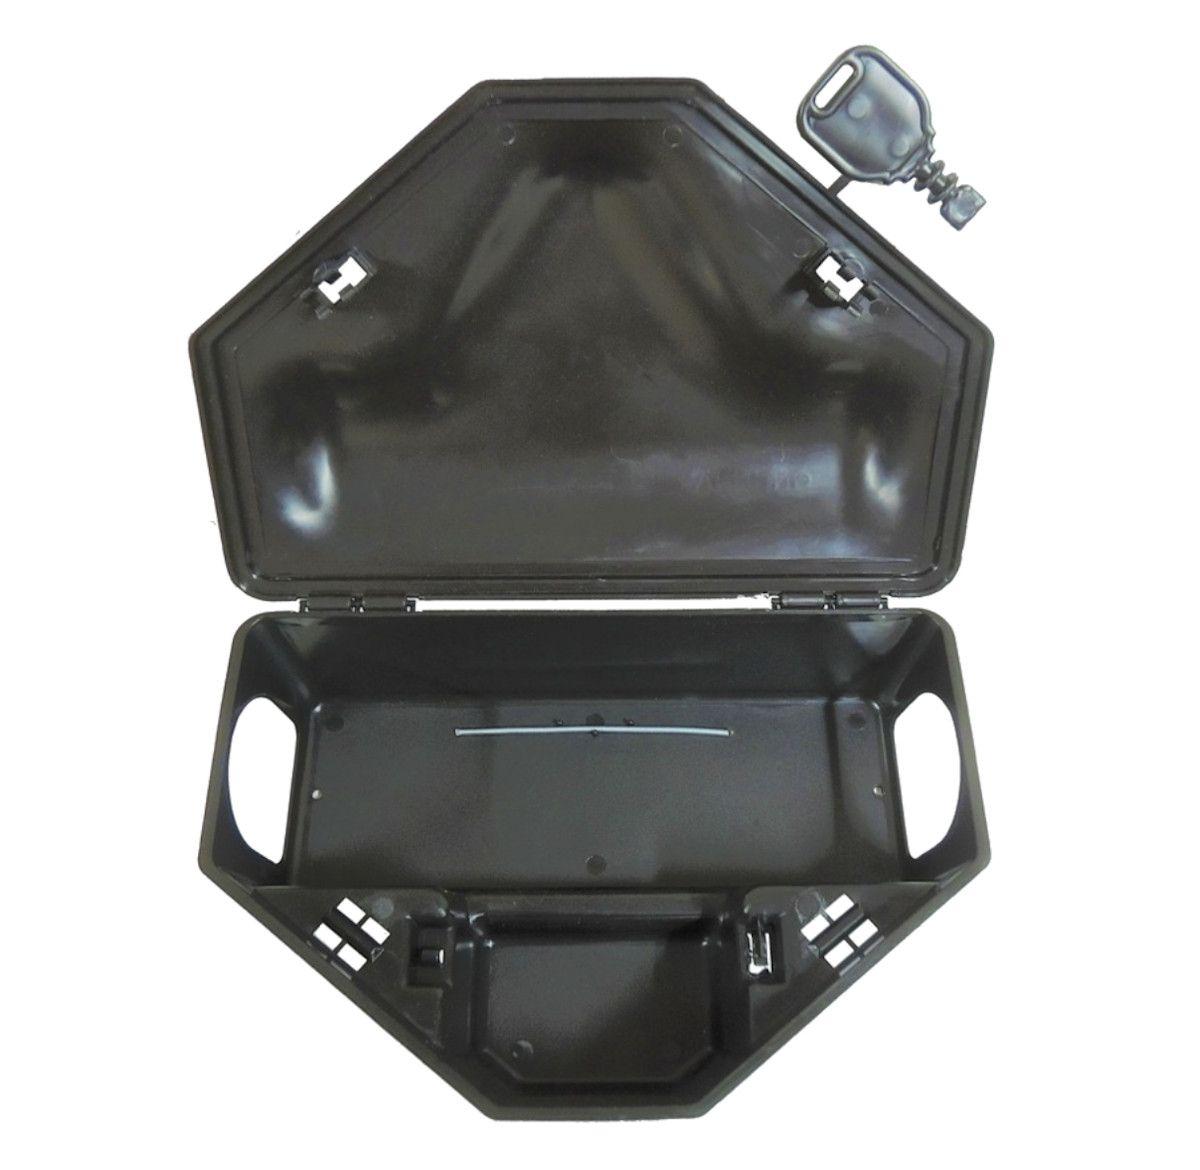 Kit 79 Porta Isca Com 2 Chaves - Duplo Travamento